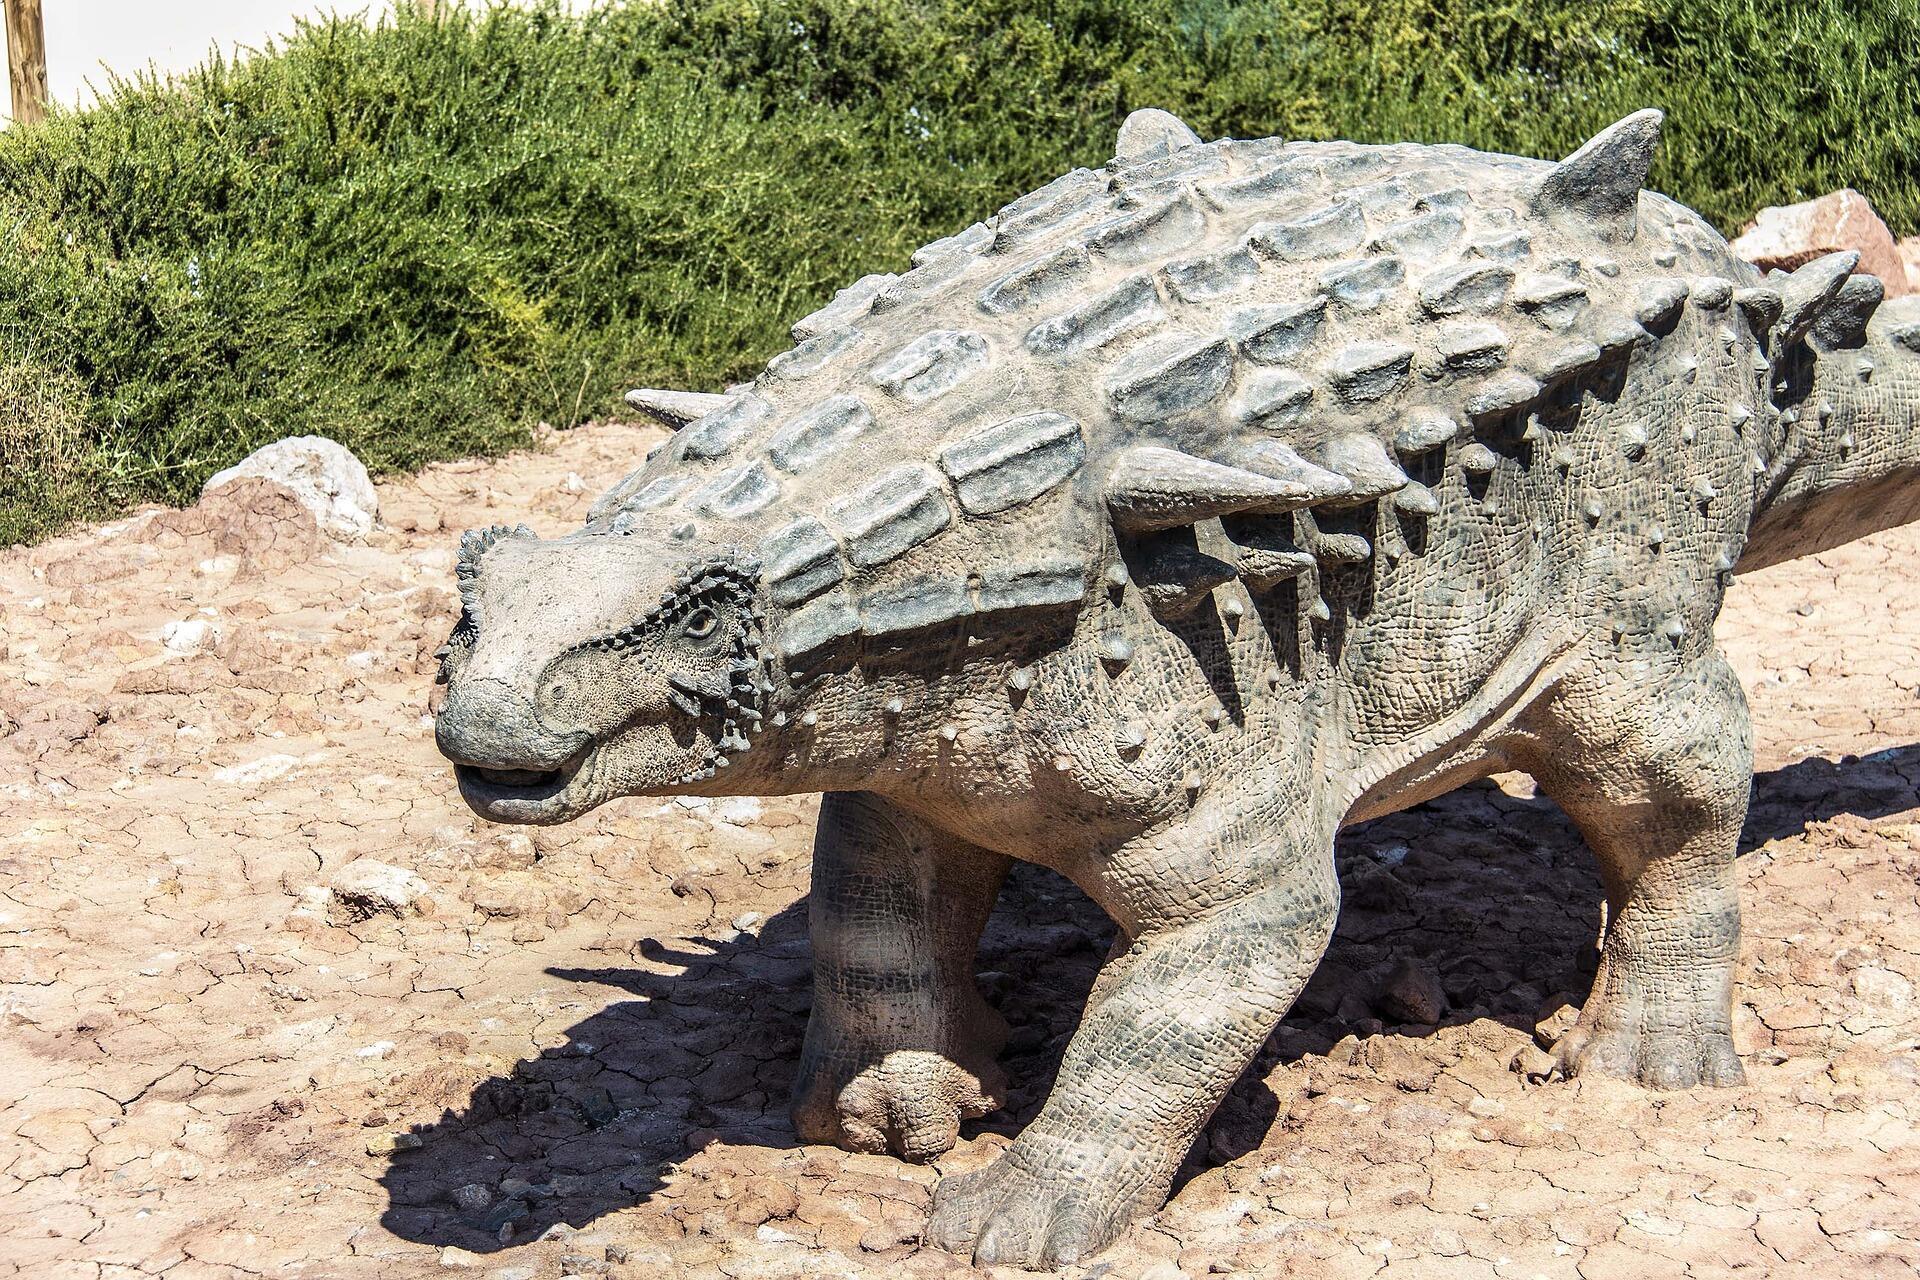 dinosaurs-3770167_1920